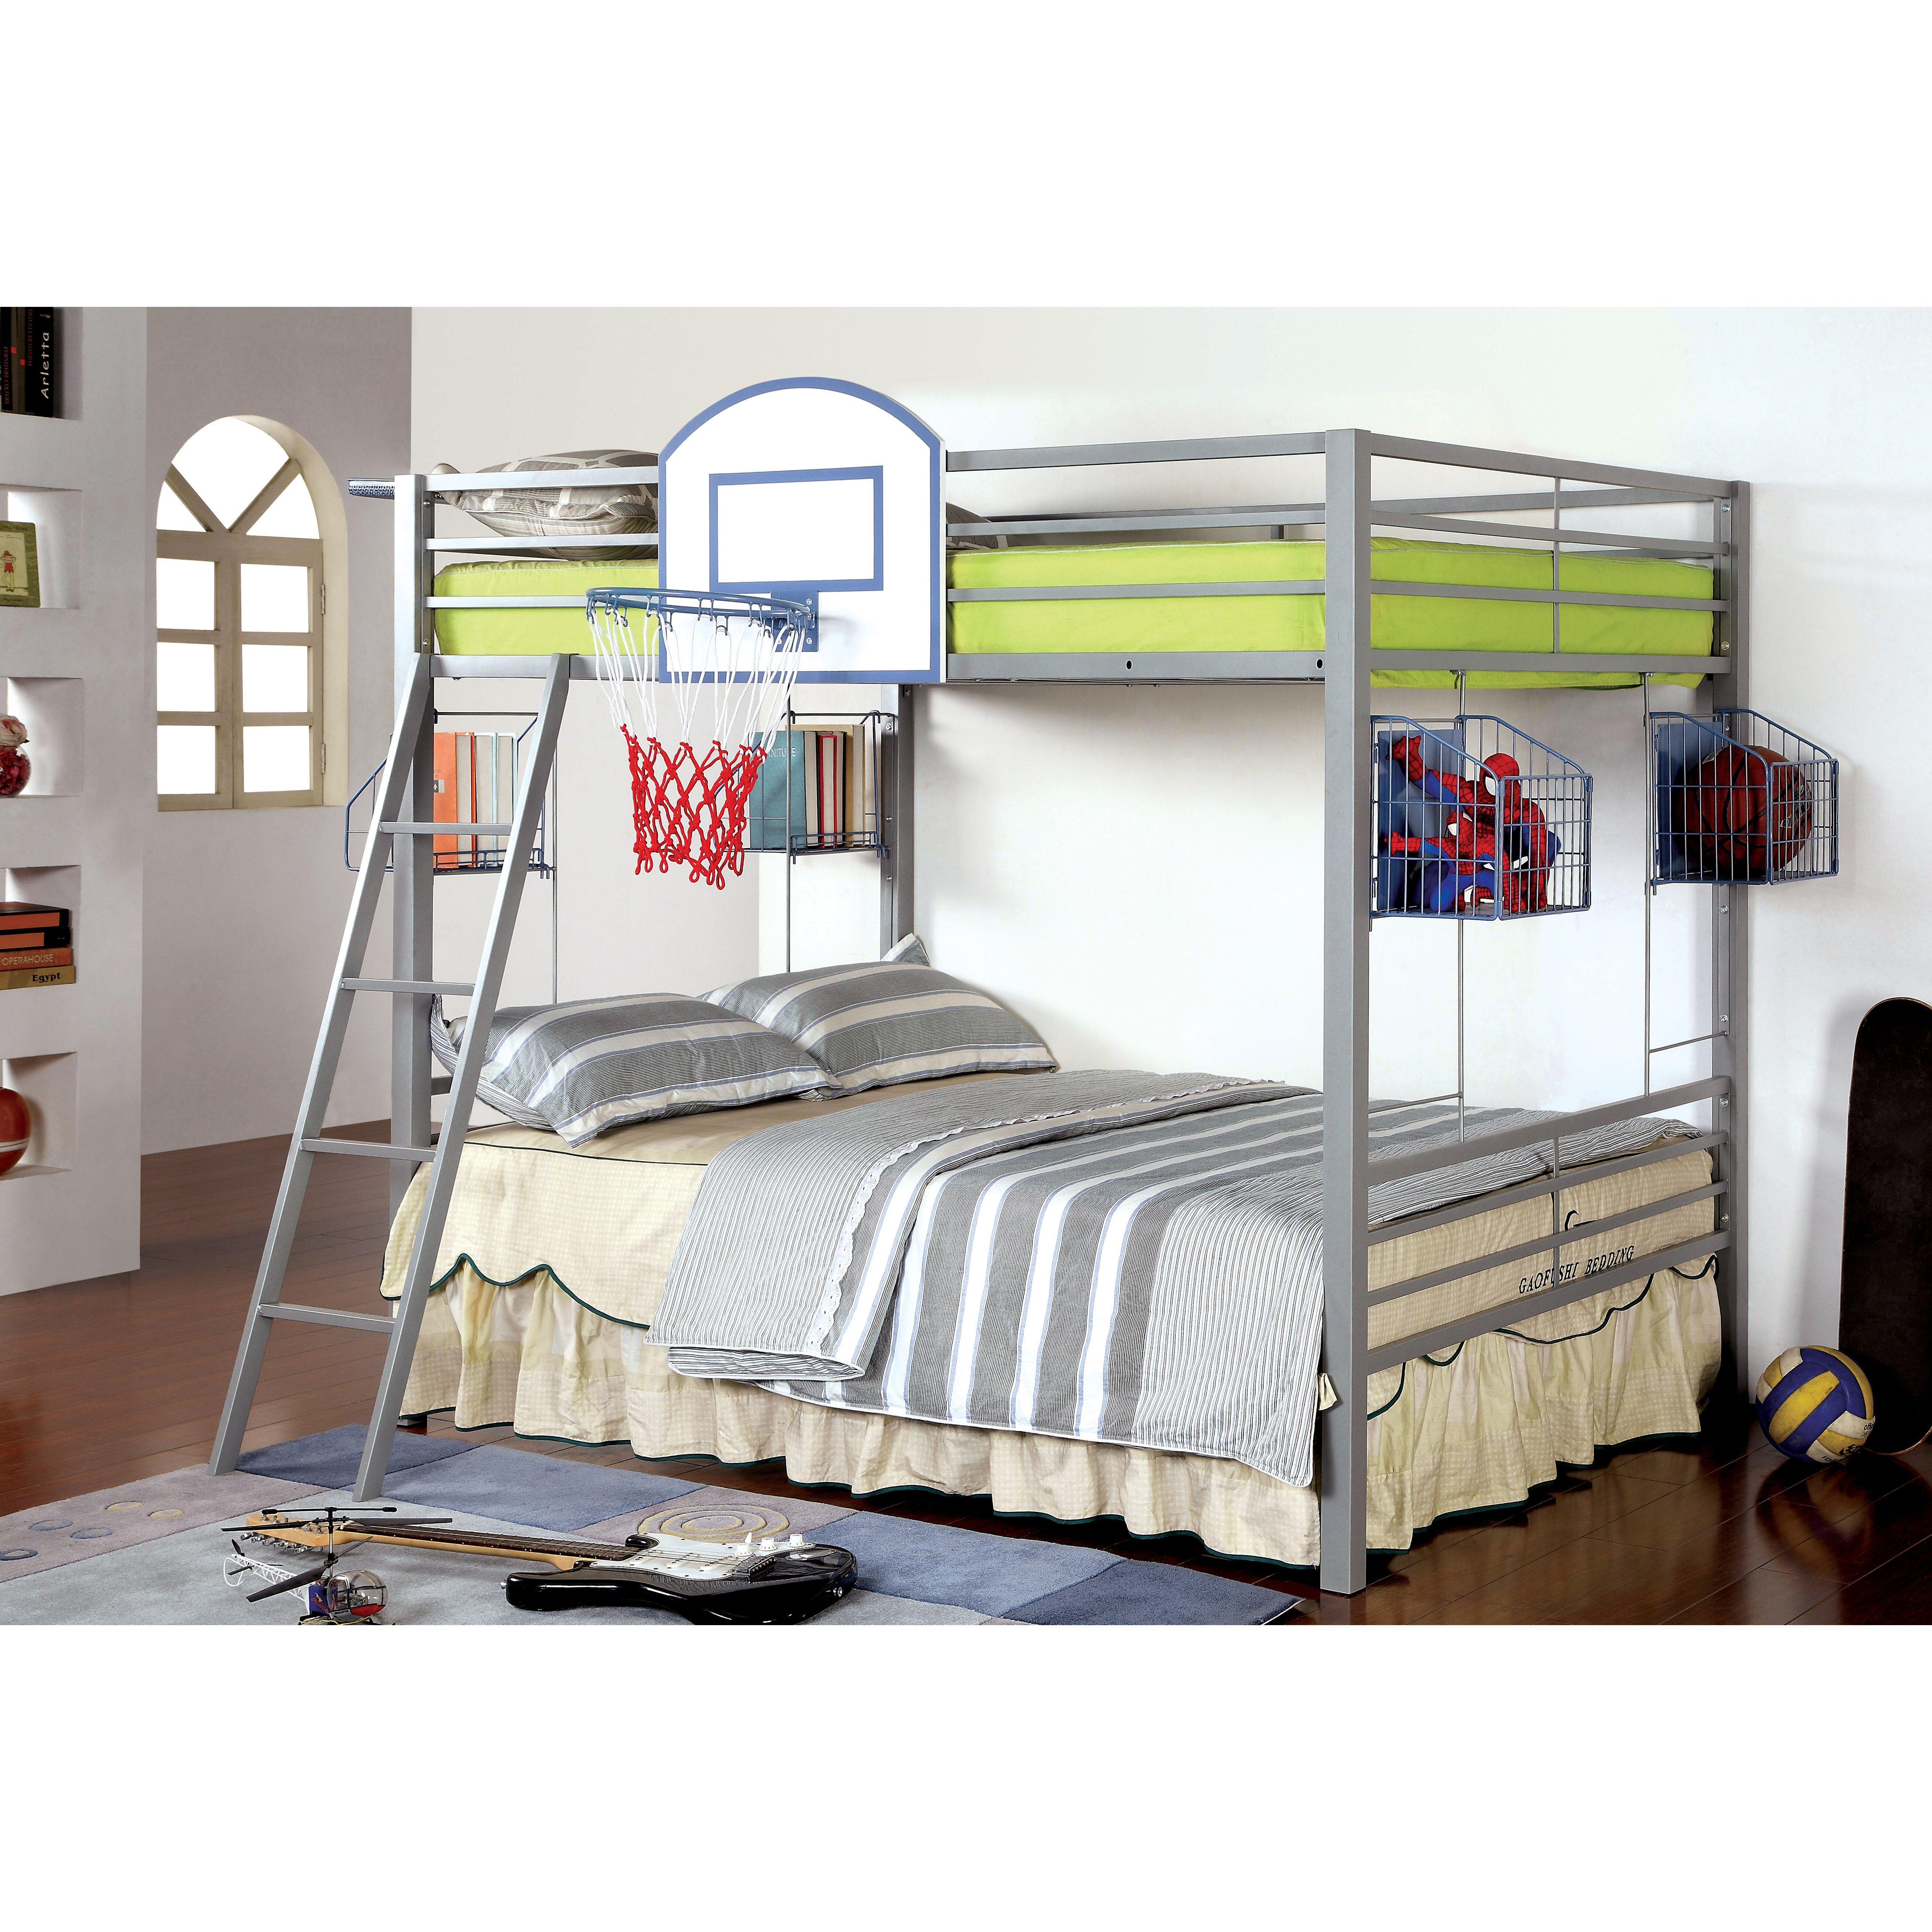 Hokku Designs Sporty Full over Full Bunk Bed Wayfair : Sporty Full Over Full Standard Bunk Bed JEG CL038TDDS from www.wayfair.com size 5232 x 5232 jpeg 3889kB